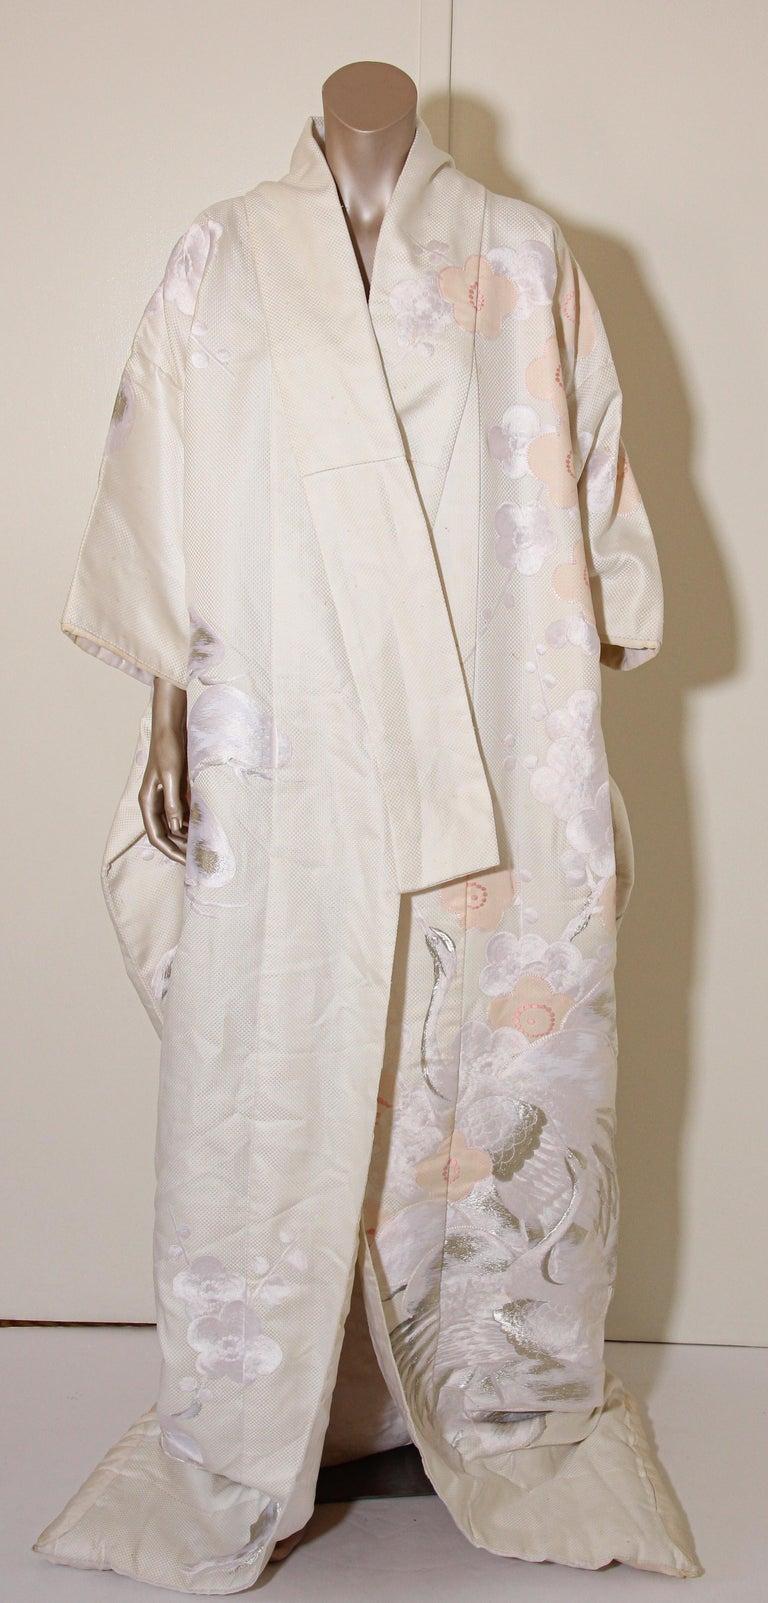 Vintage Collectable Japanese White Silk Ceremonial Wedding Kimono For Sale 13